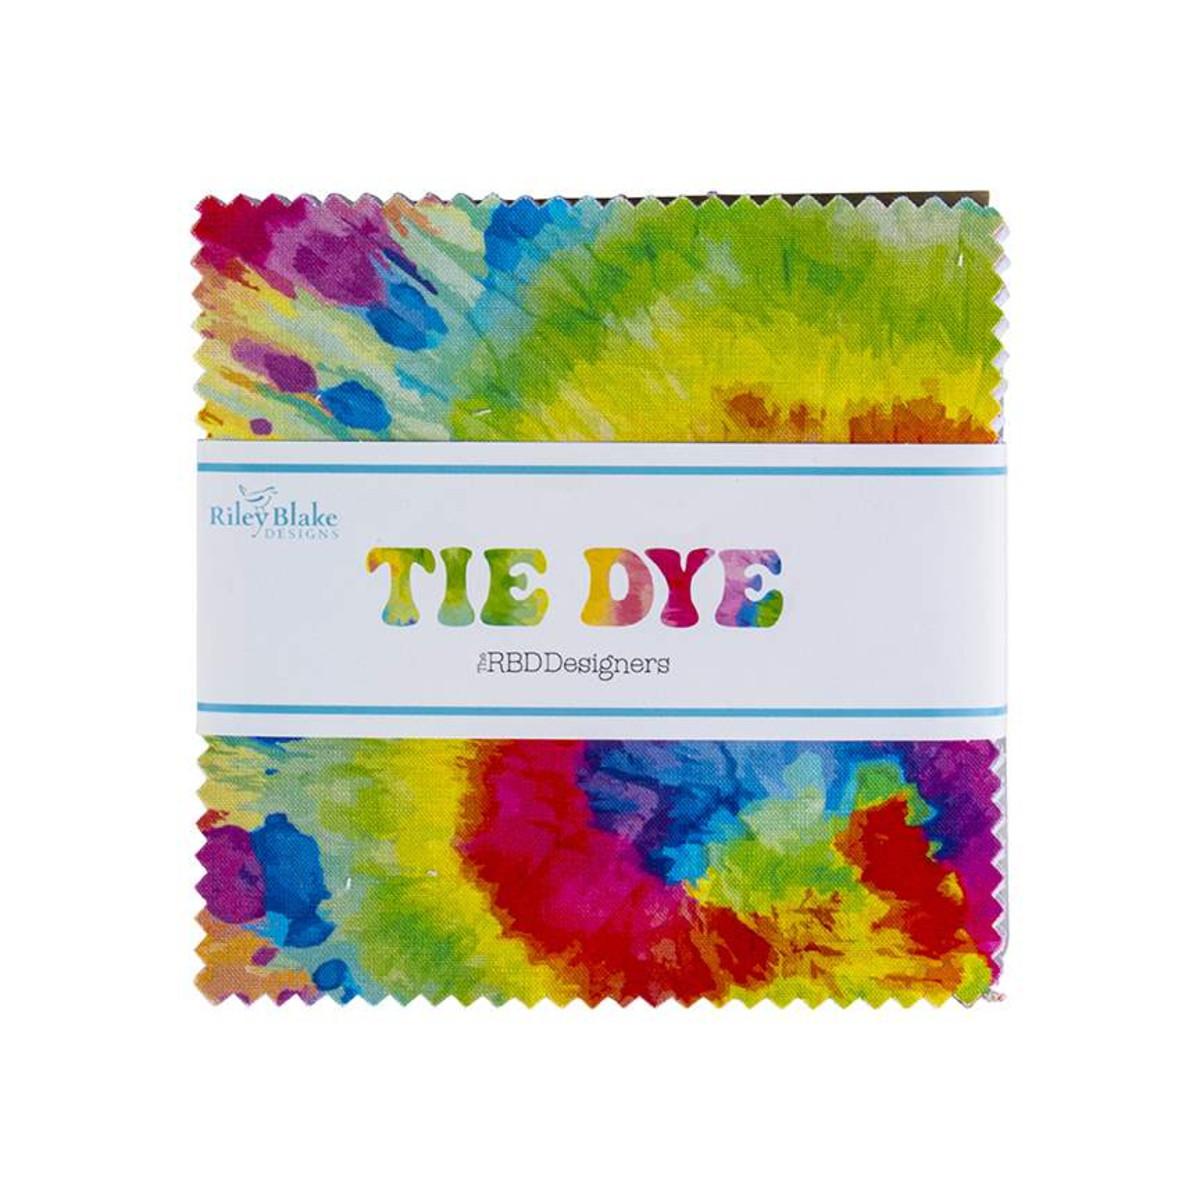 Riley Blake Charm Pack - Tie Dye by The RBD Designers